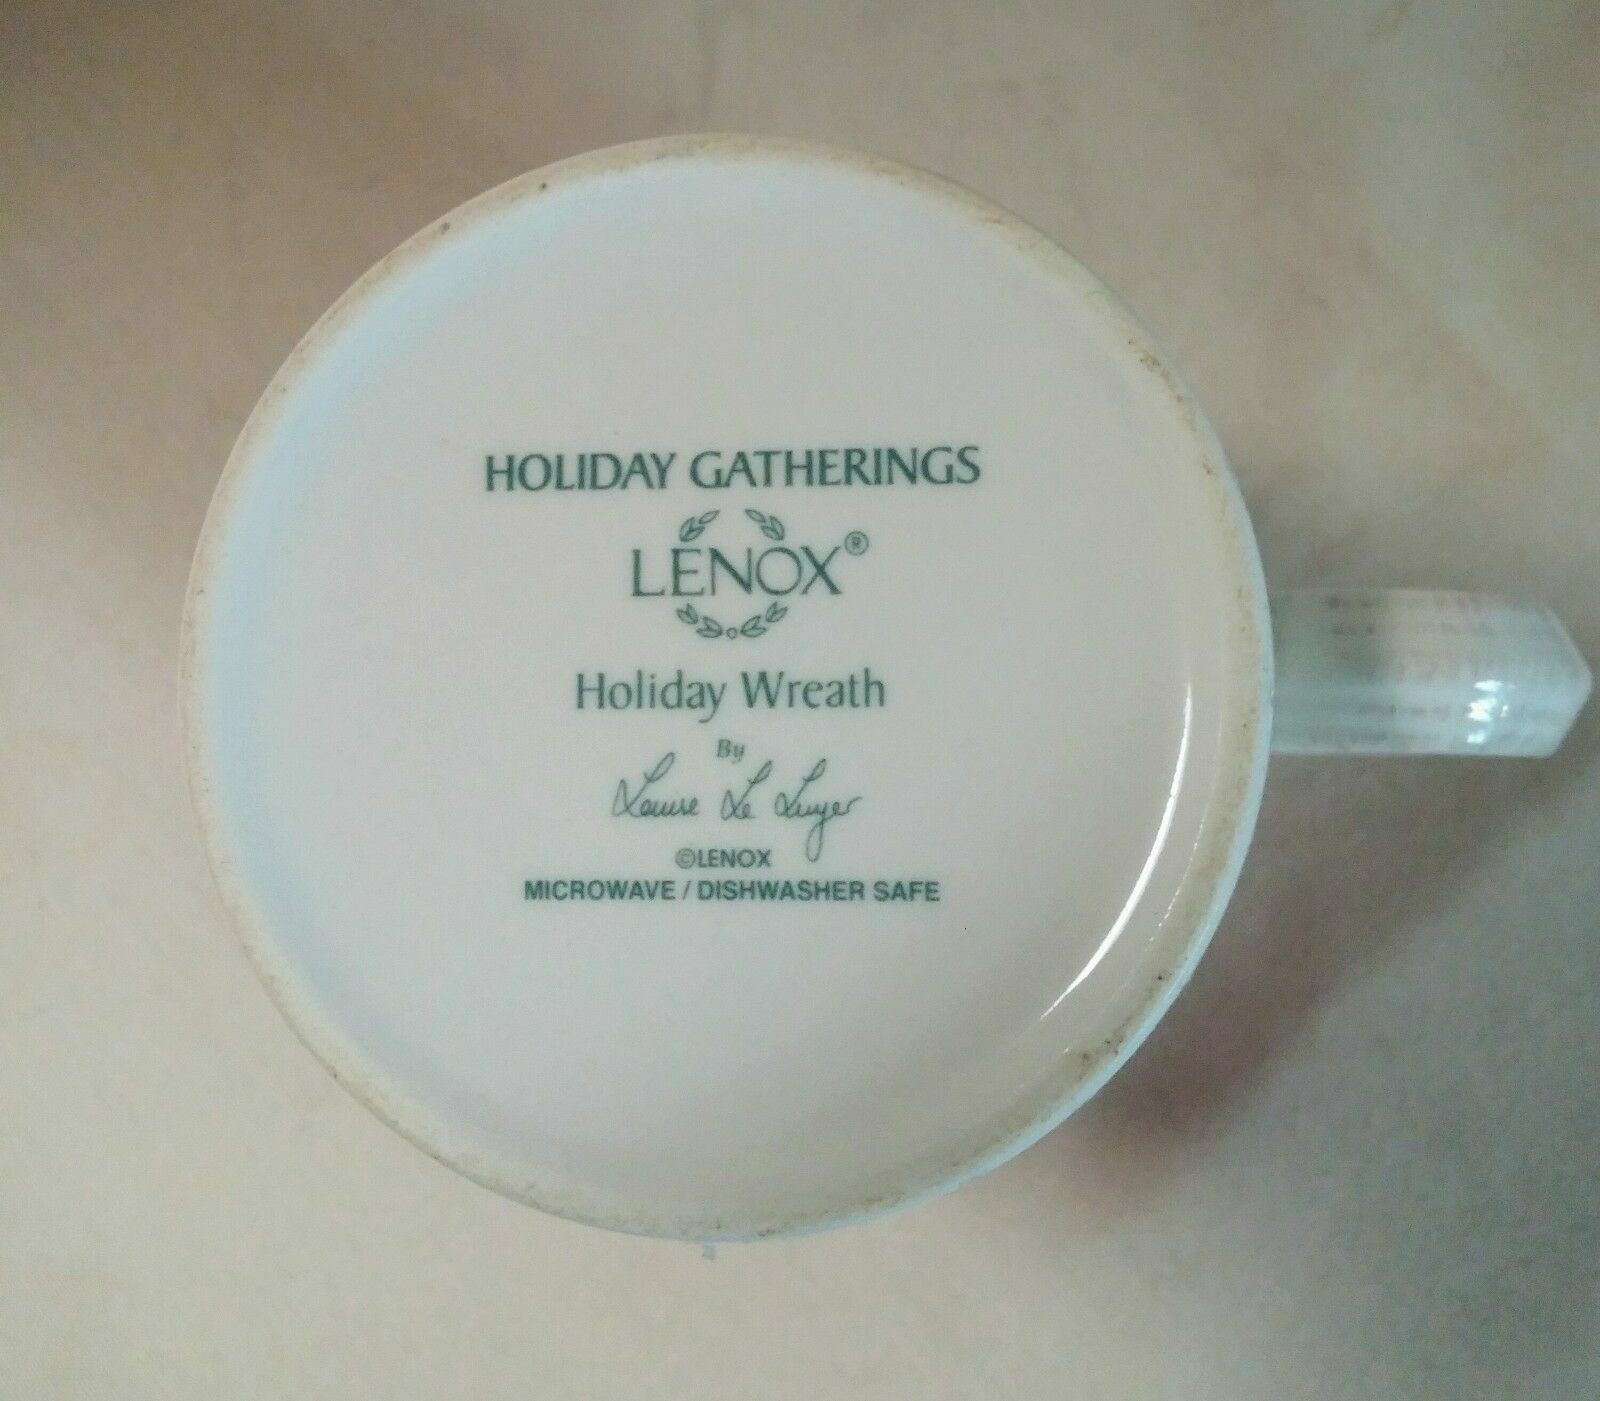 LENOX HOLIDAY GATHERINGS WREATH Mug - $29.95